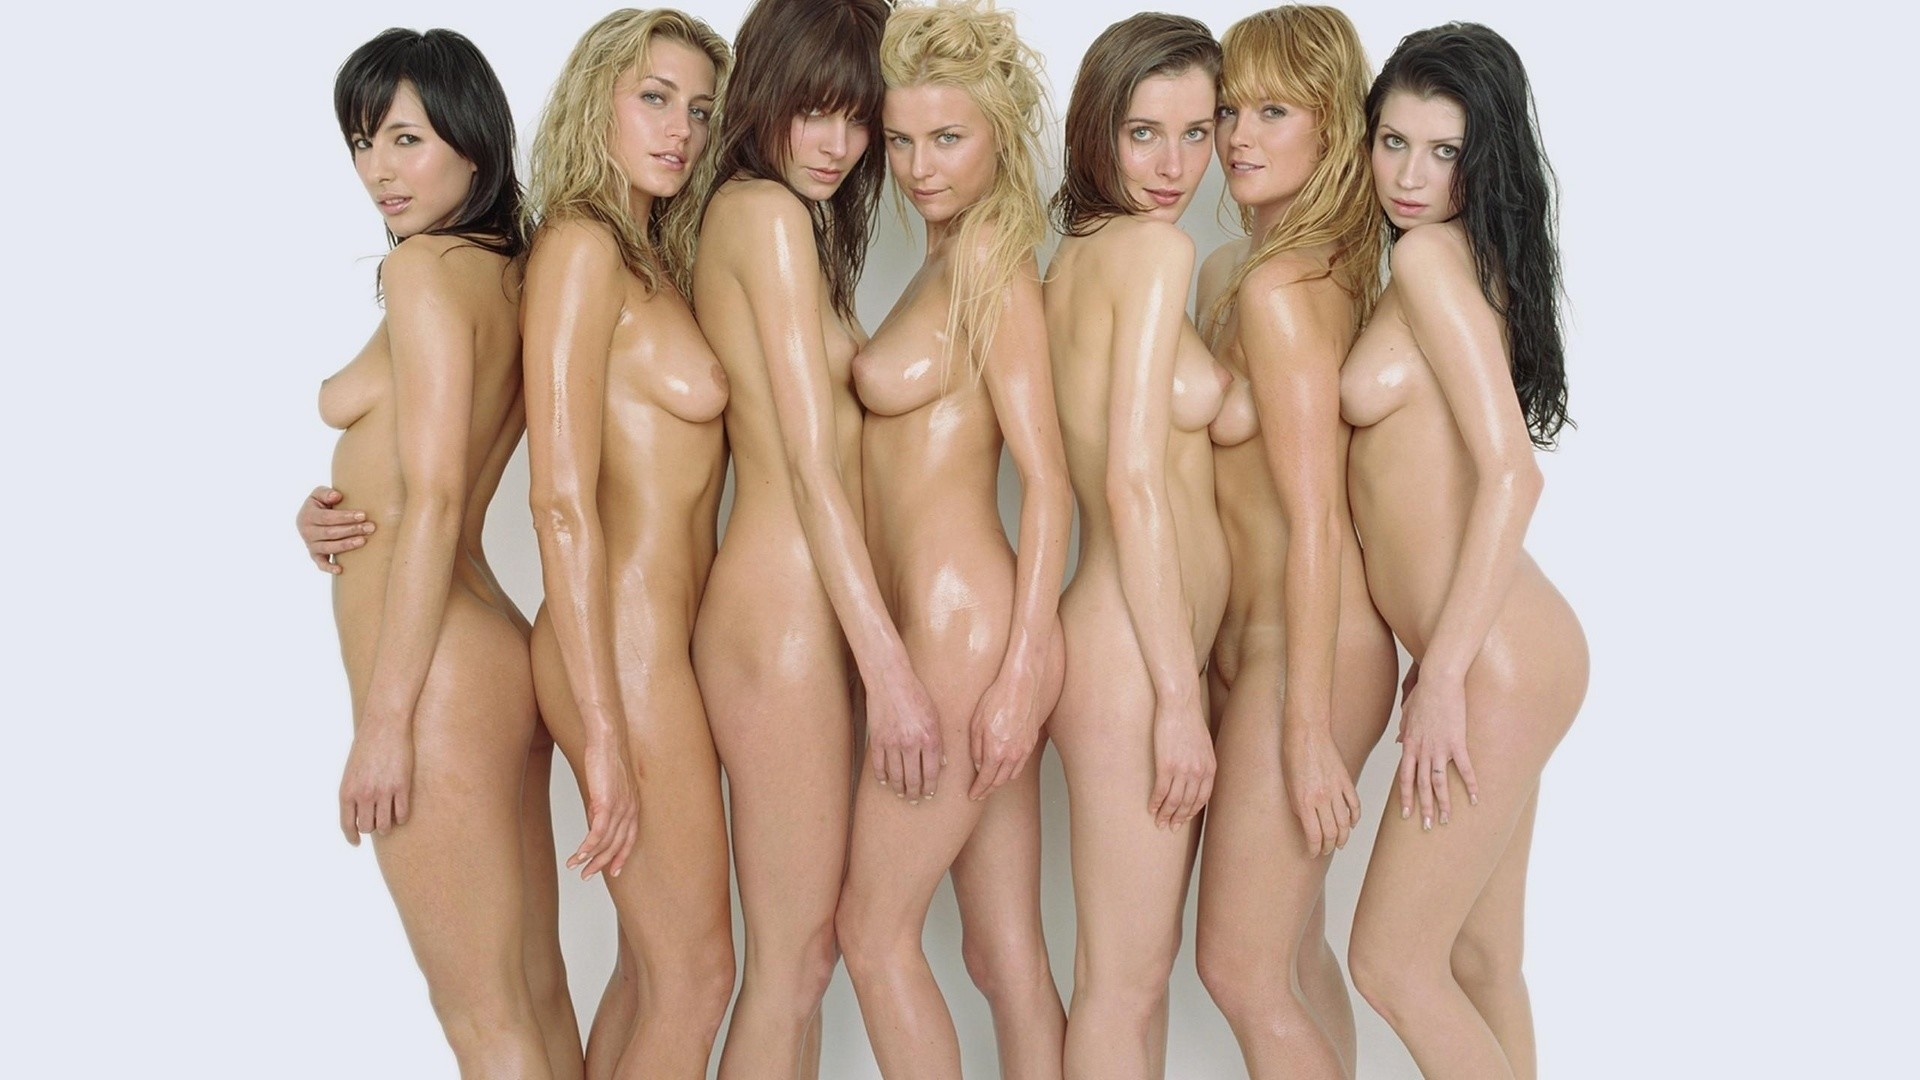 Mtv uk reality star kayleigh morris nude sexy photos